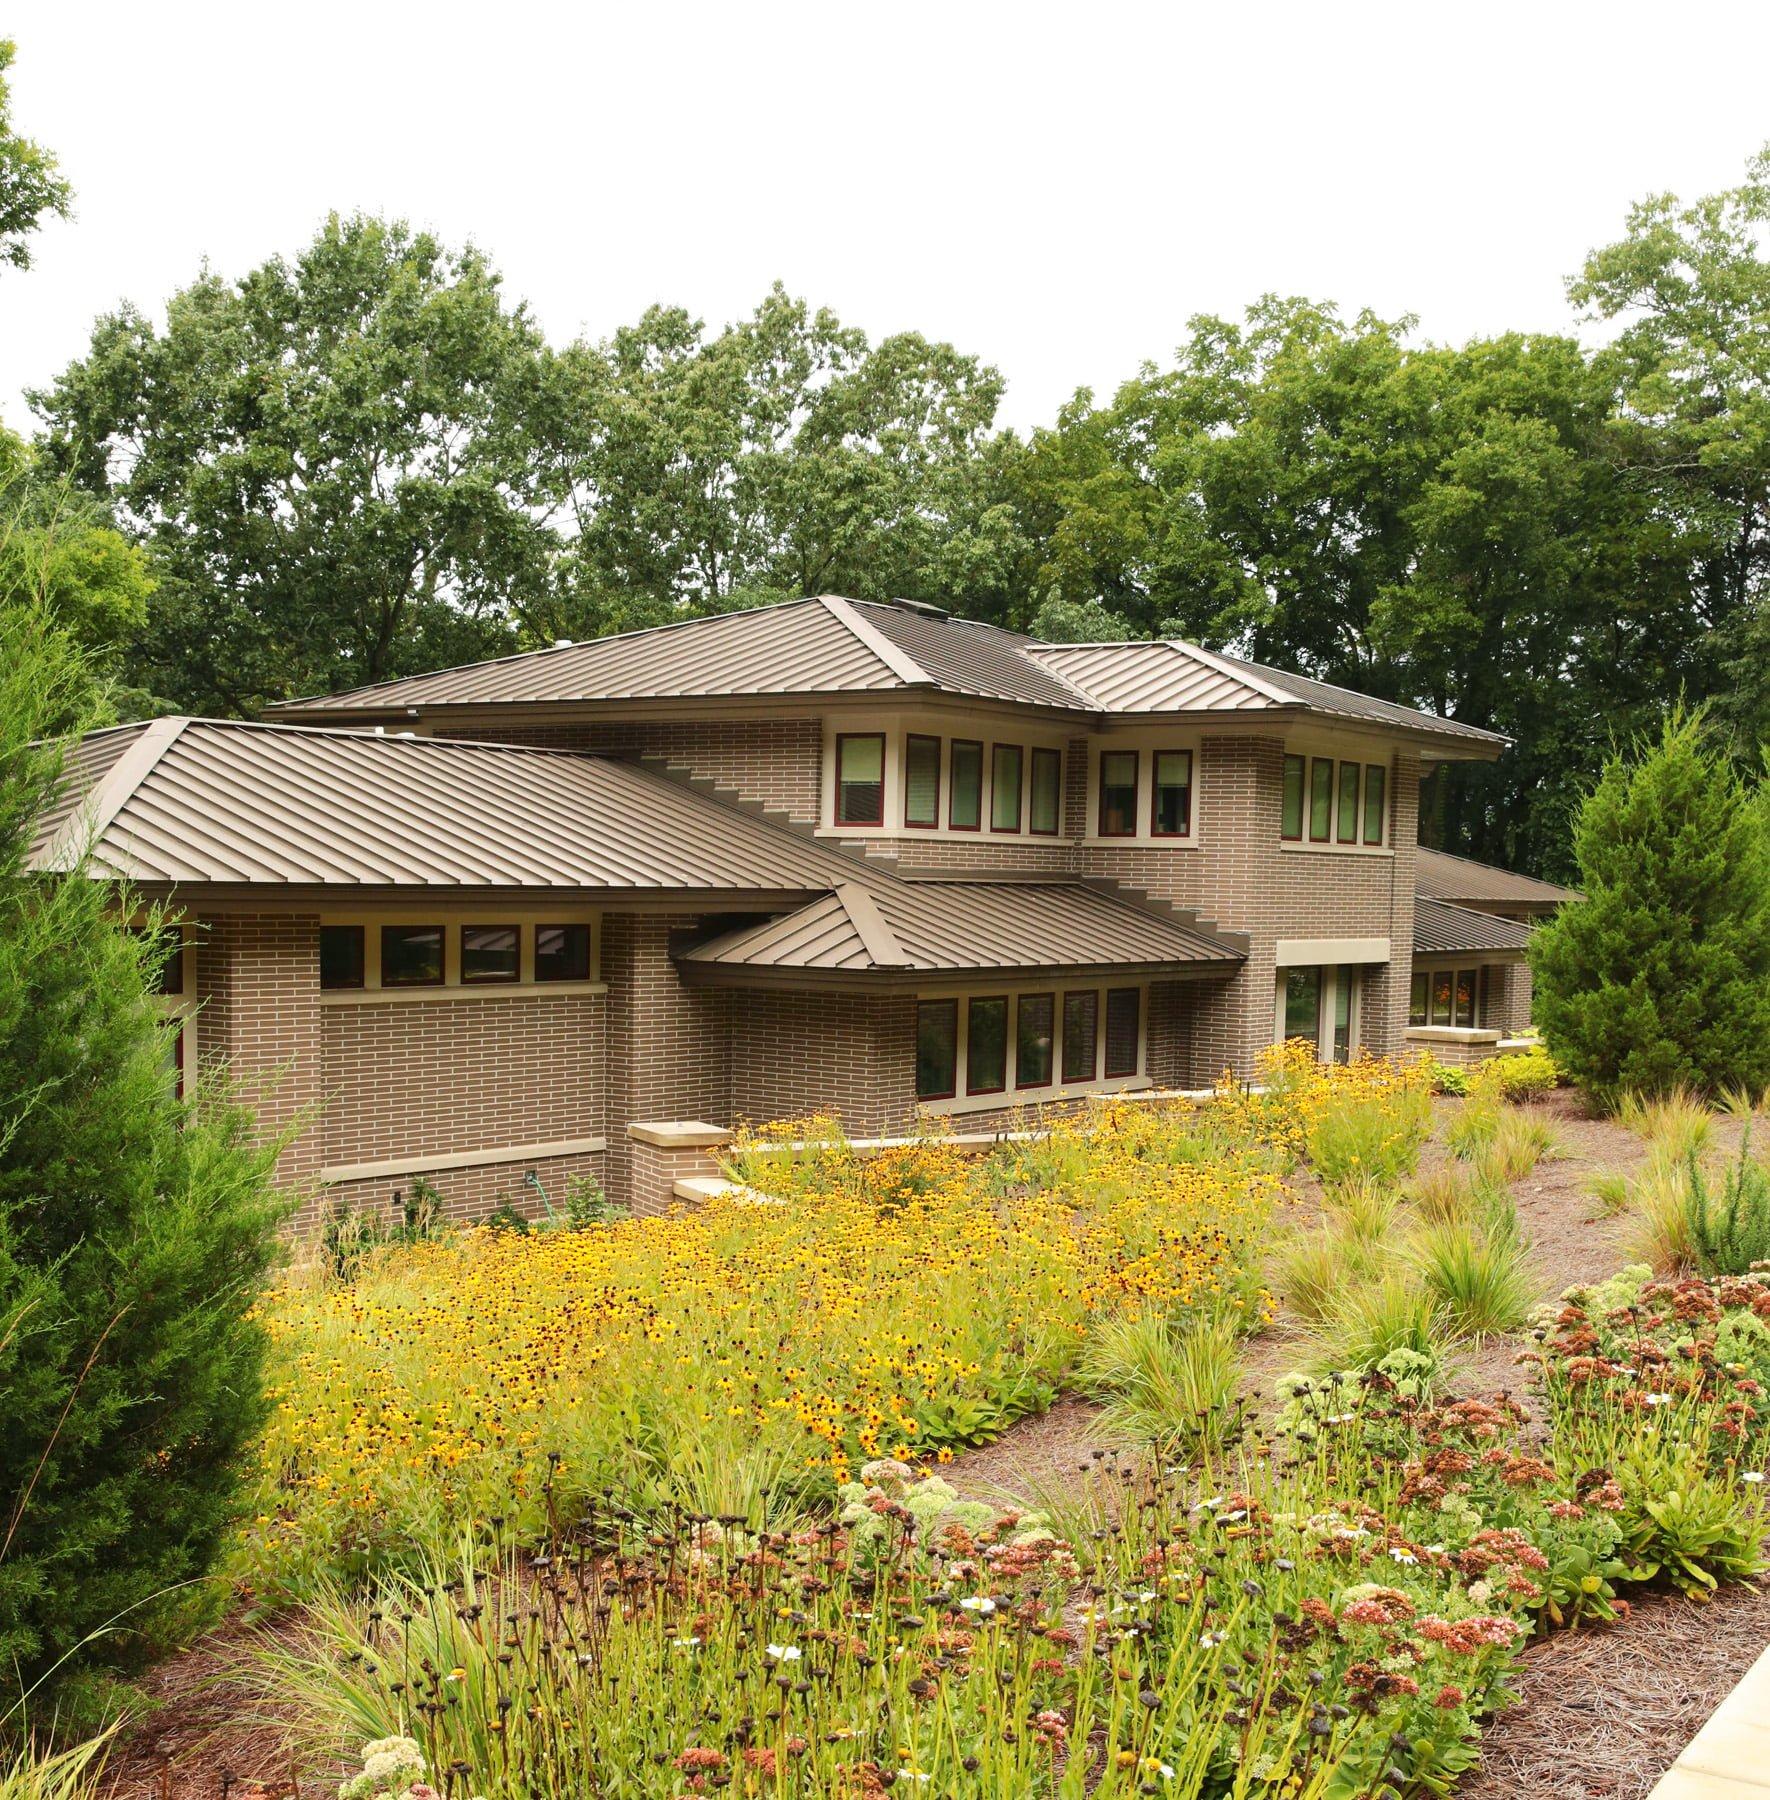 Murdock Residence Front 2 (1770x1800)